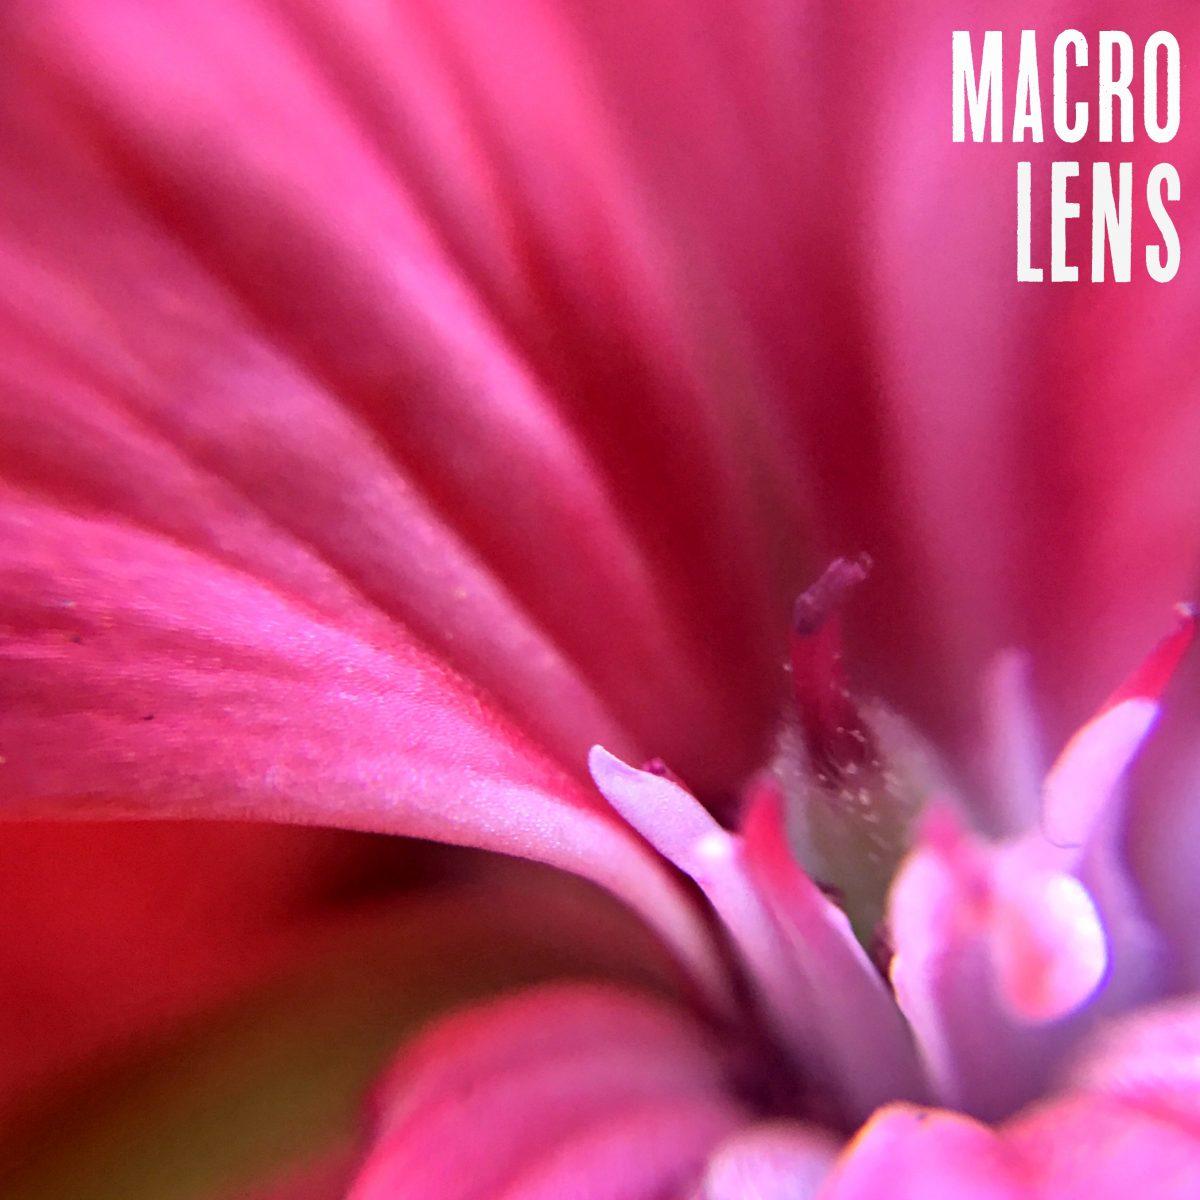 Amir Macro Lens Eample Hip2Save.com